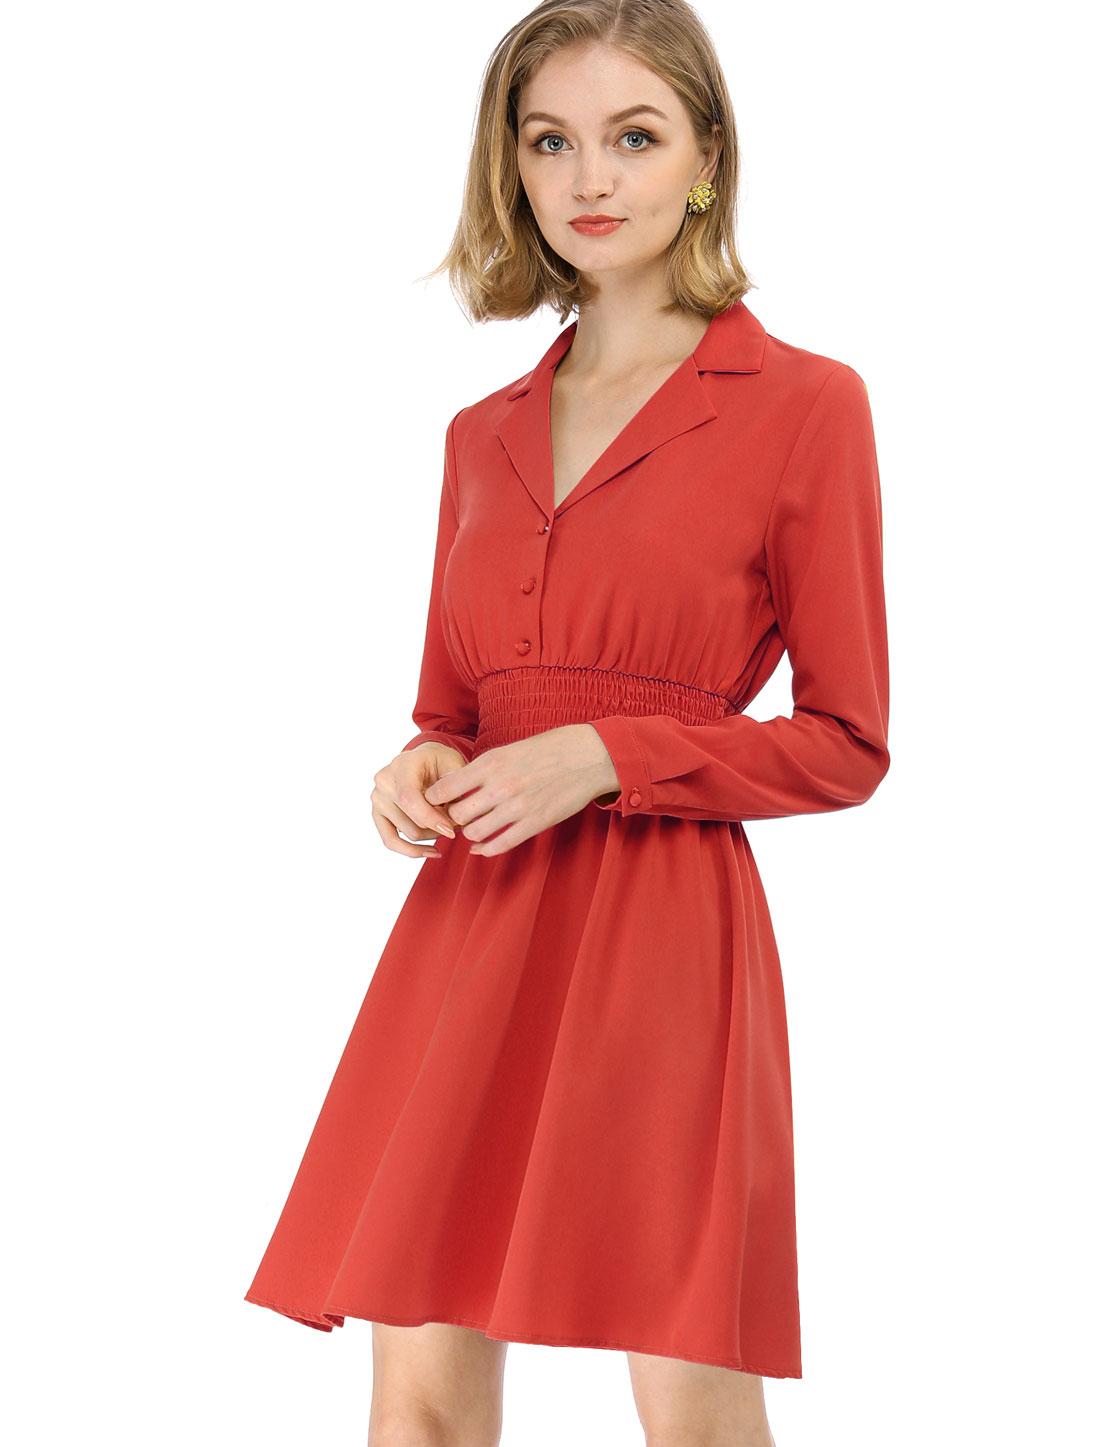 Allegra K Women's Notched Lapel Smocked Waist A-Line Dress Red Orange XS